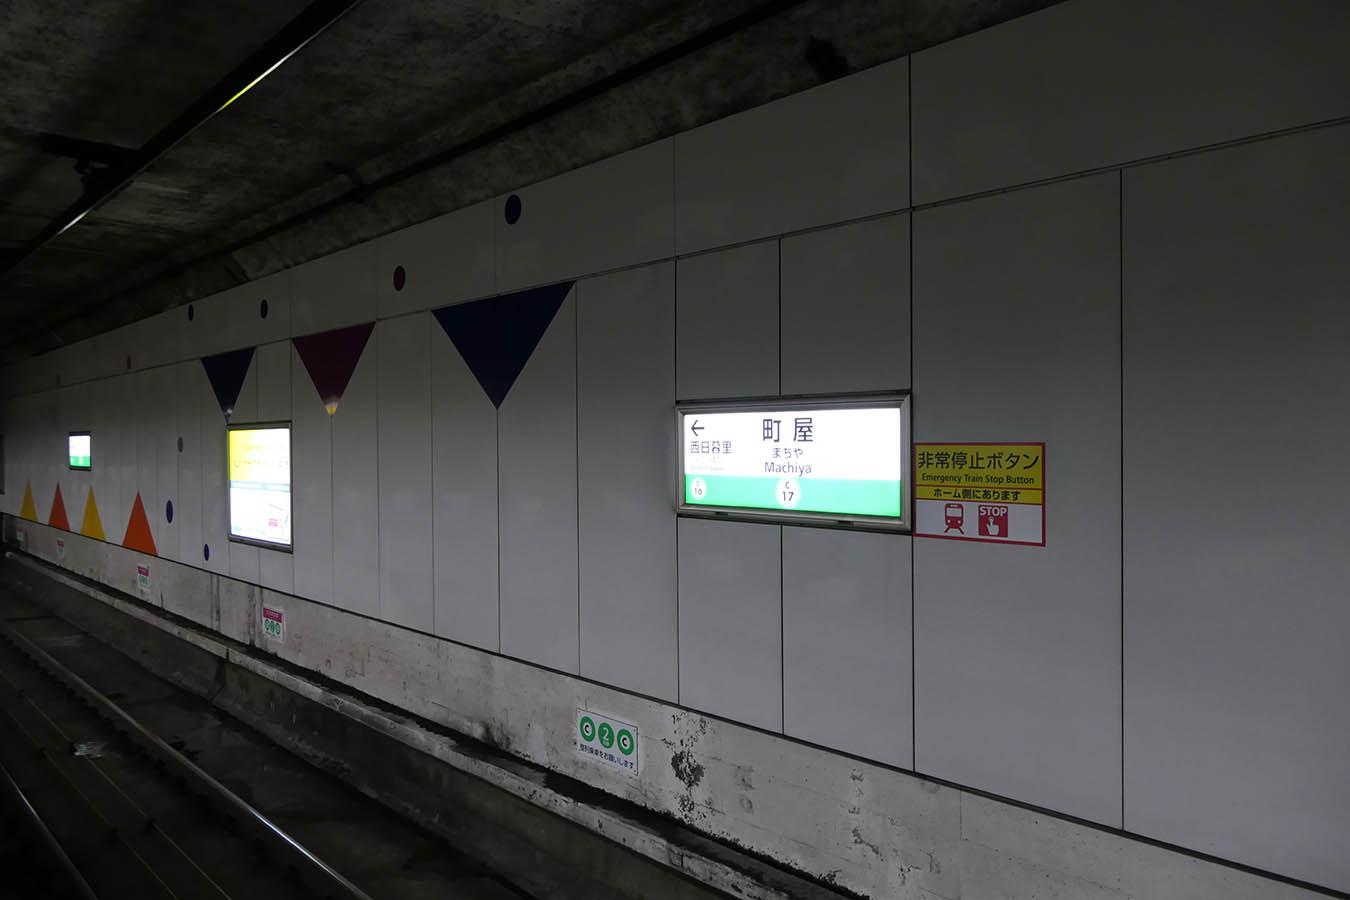 C17_photo02.jpg